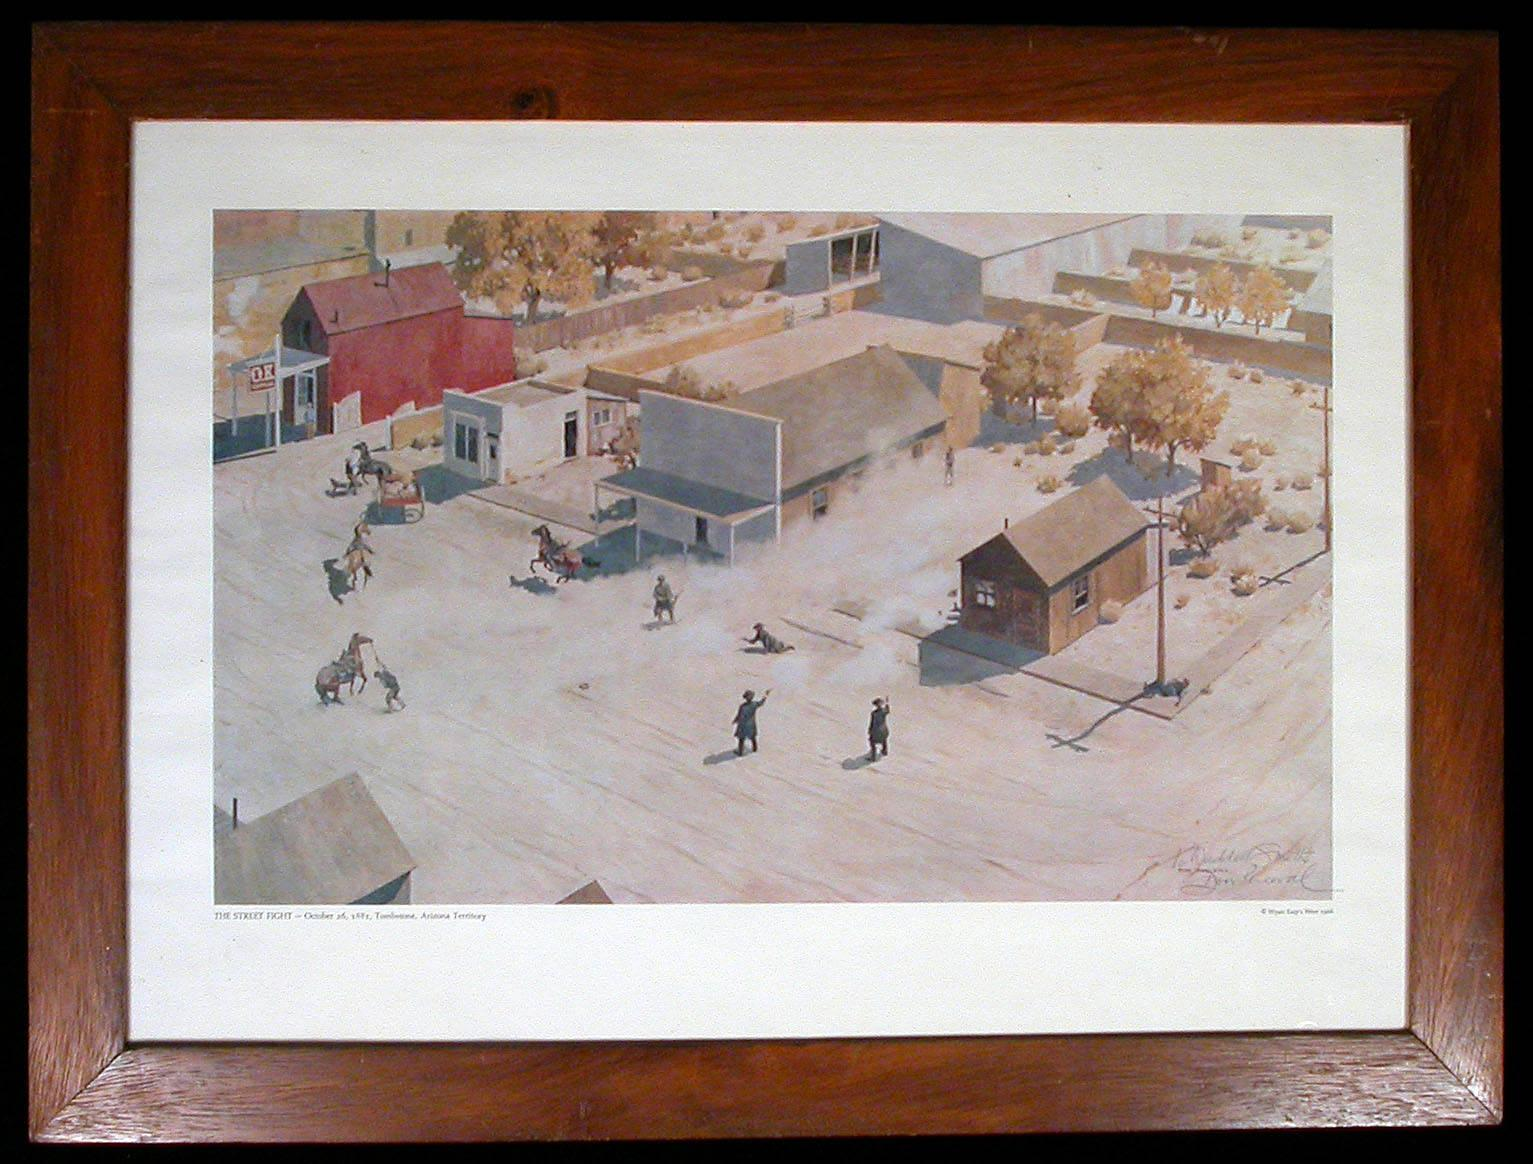 The Street Fight October 26 1881 Tombstone Arizona